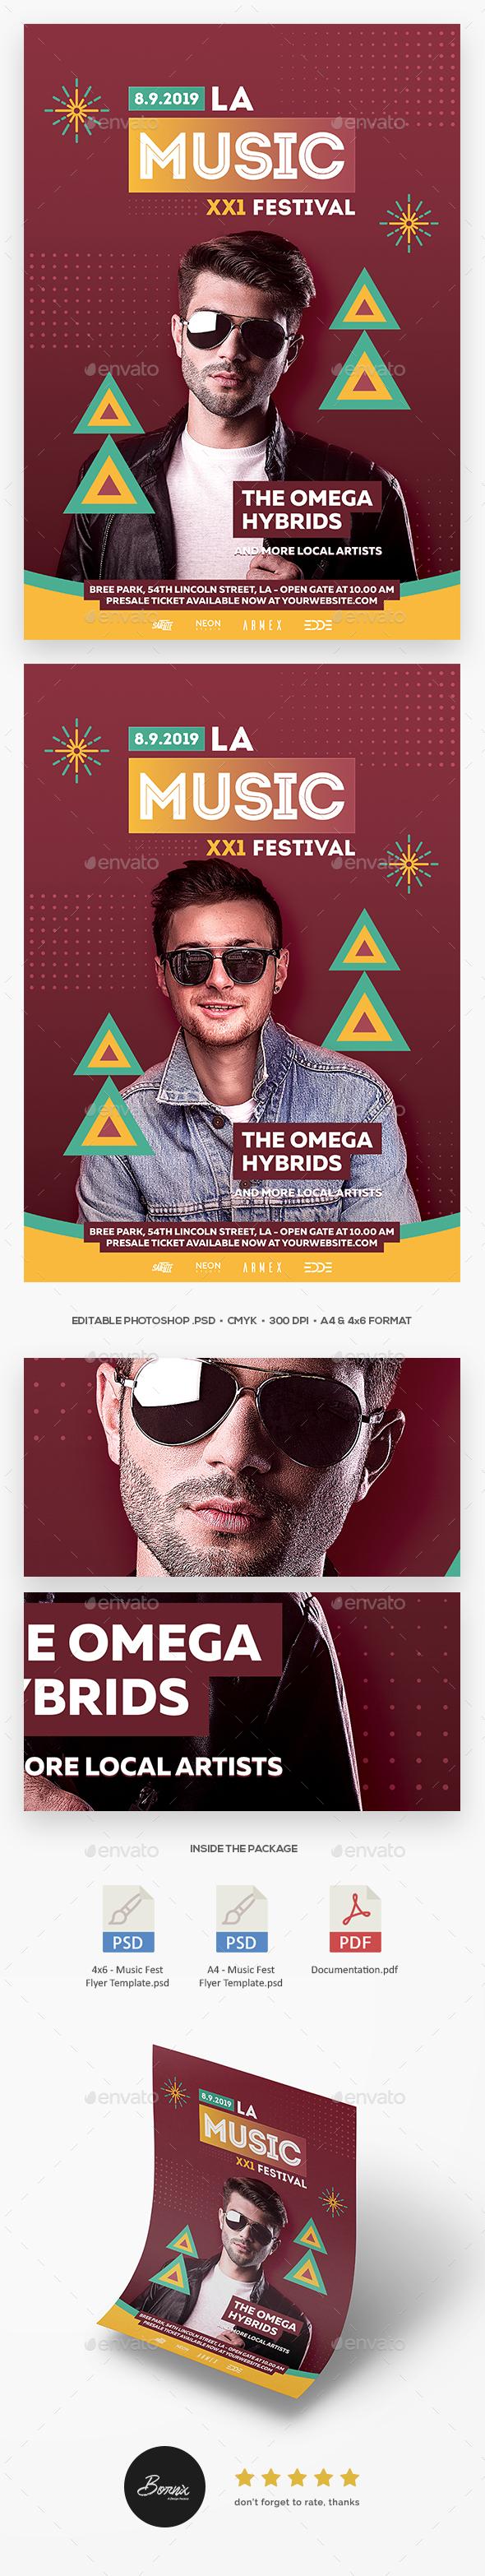 Music Fest Flyer - Concerts Events